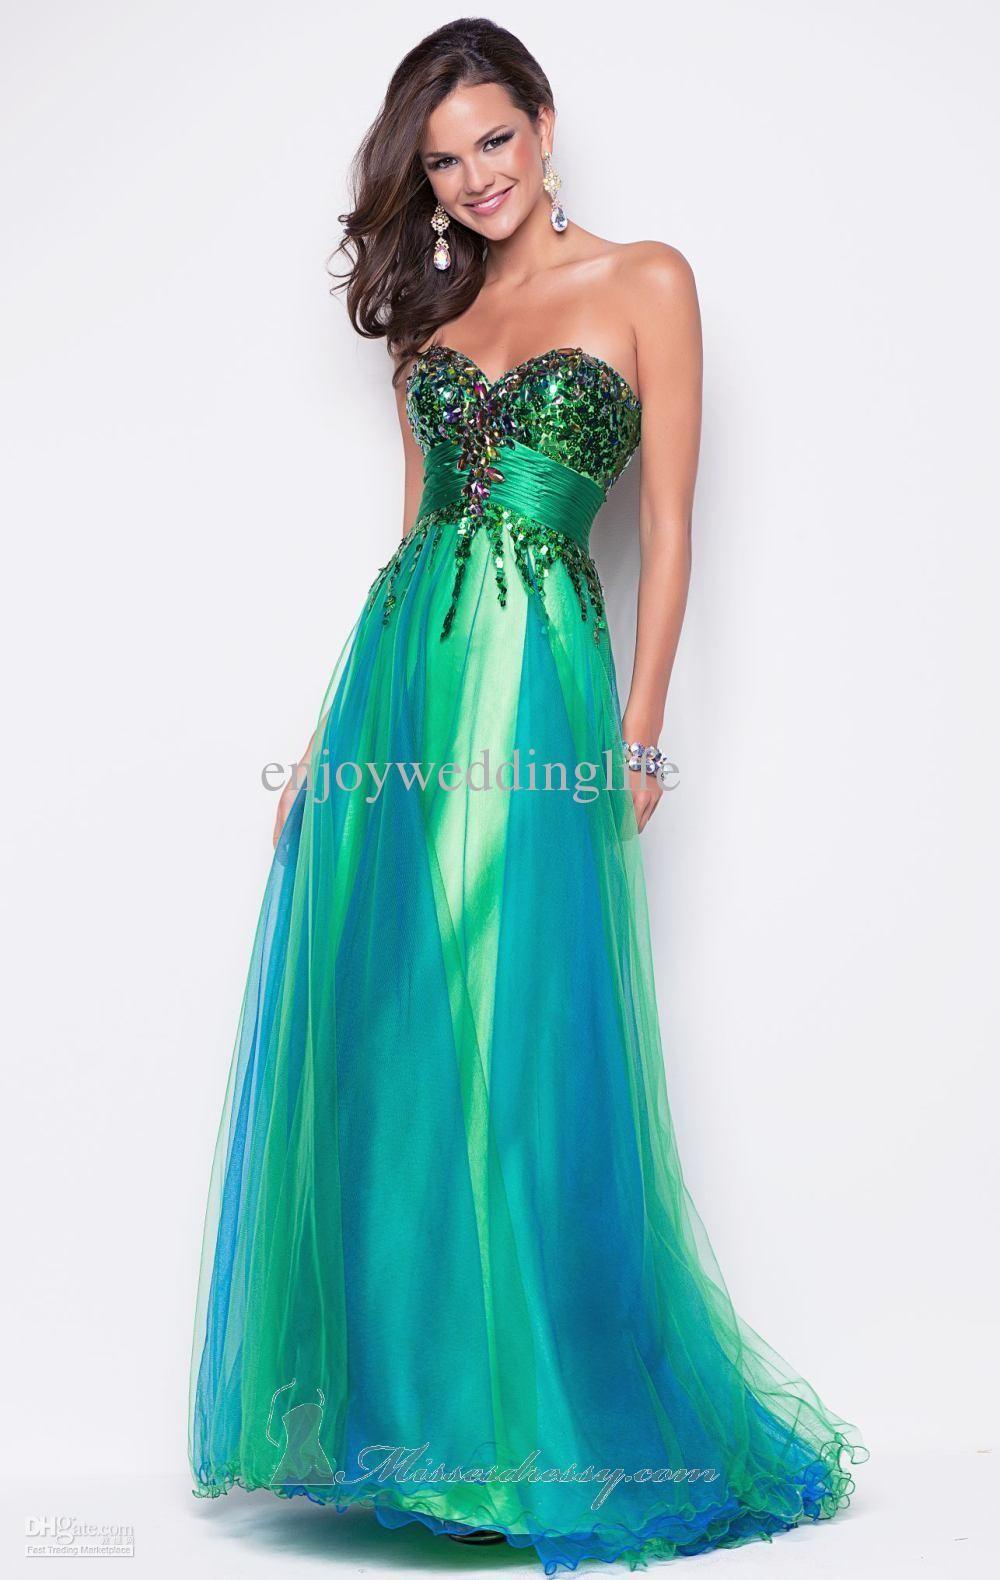 http://image.dhgate.com/albu_350212770_00-1.0x0/new-sweetheart-green ...